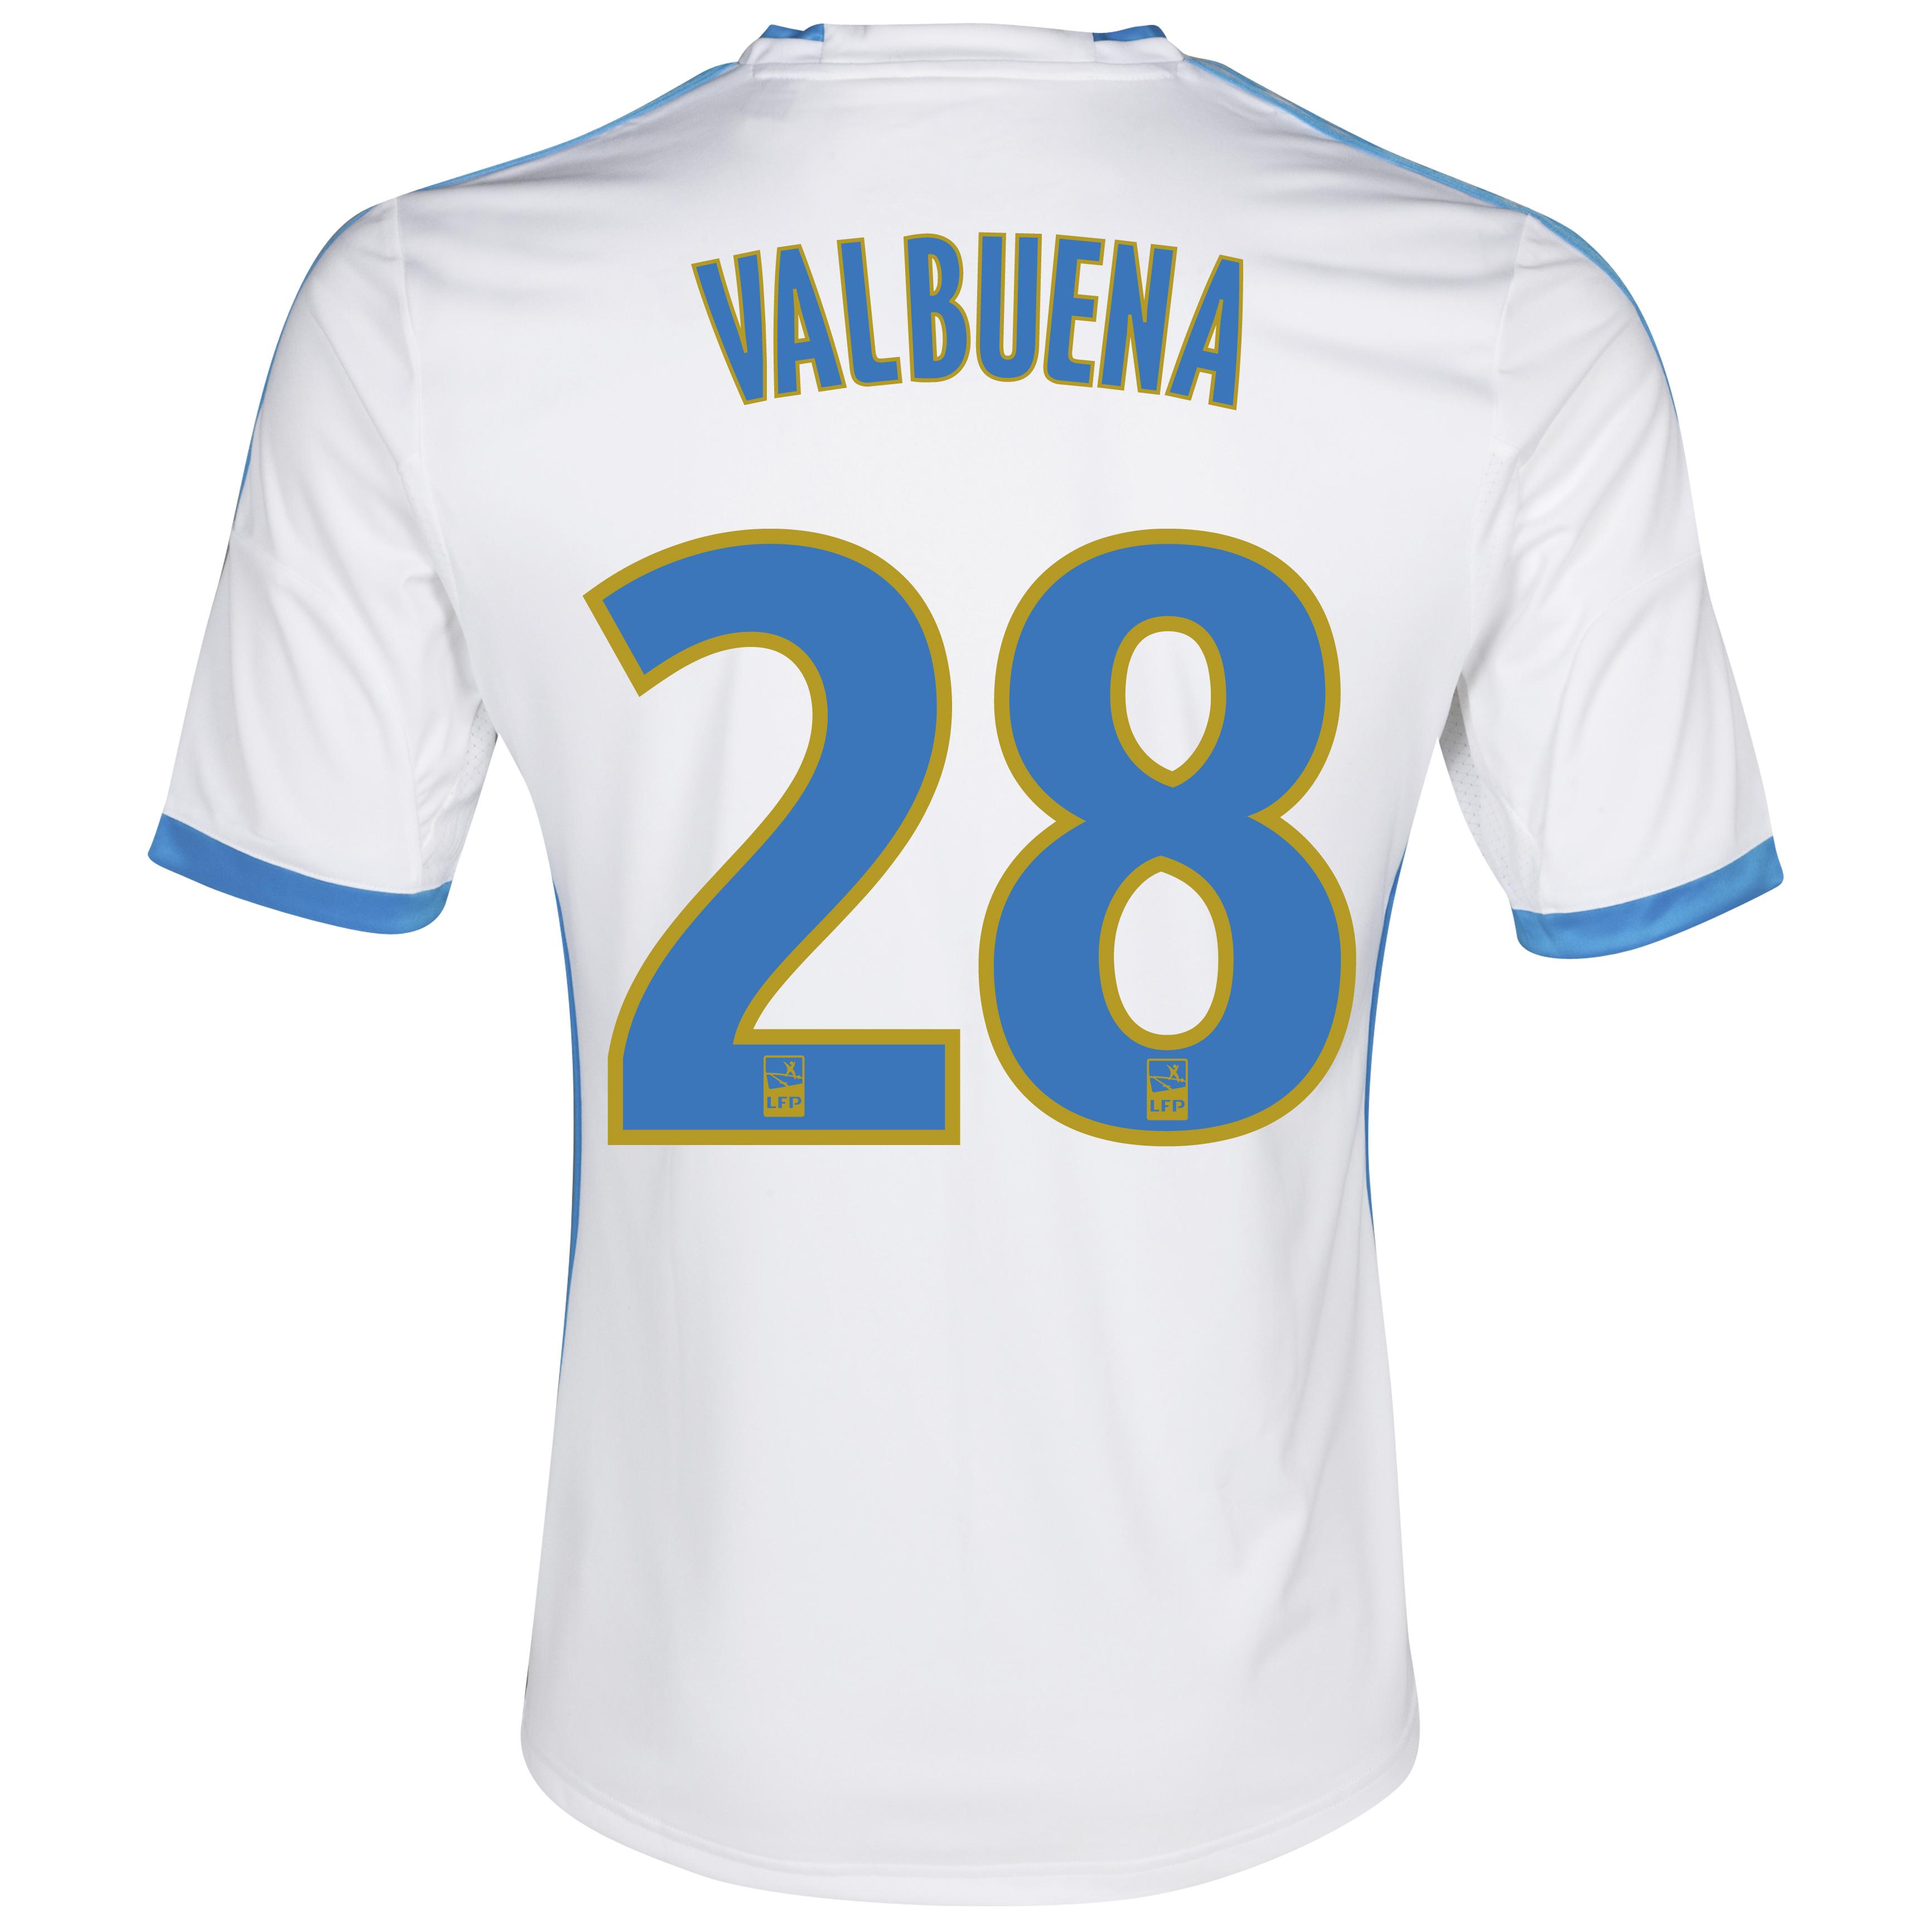 Olympique De Marseille Home Shirt SS 2013/14 - Womens White with Valbuena 28 printing